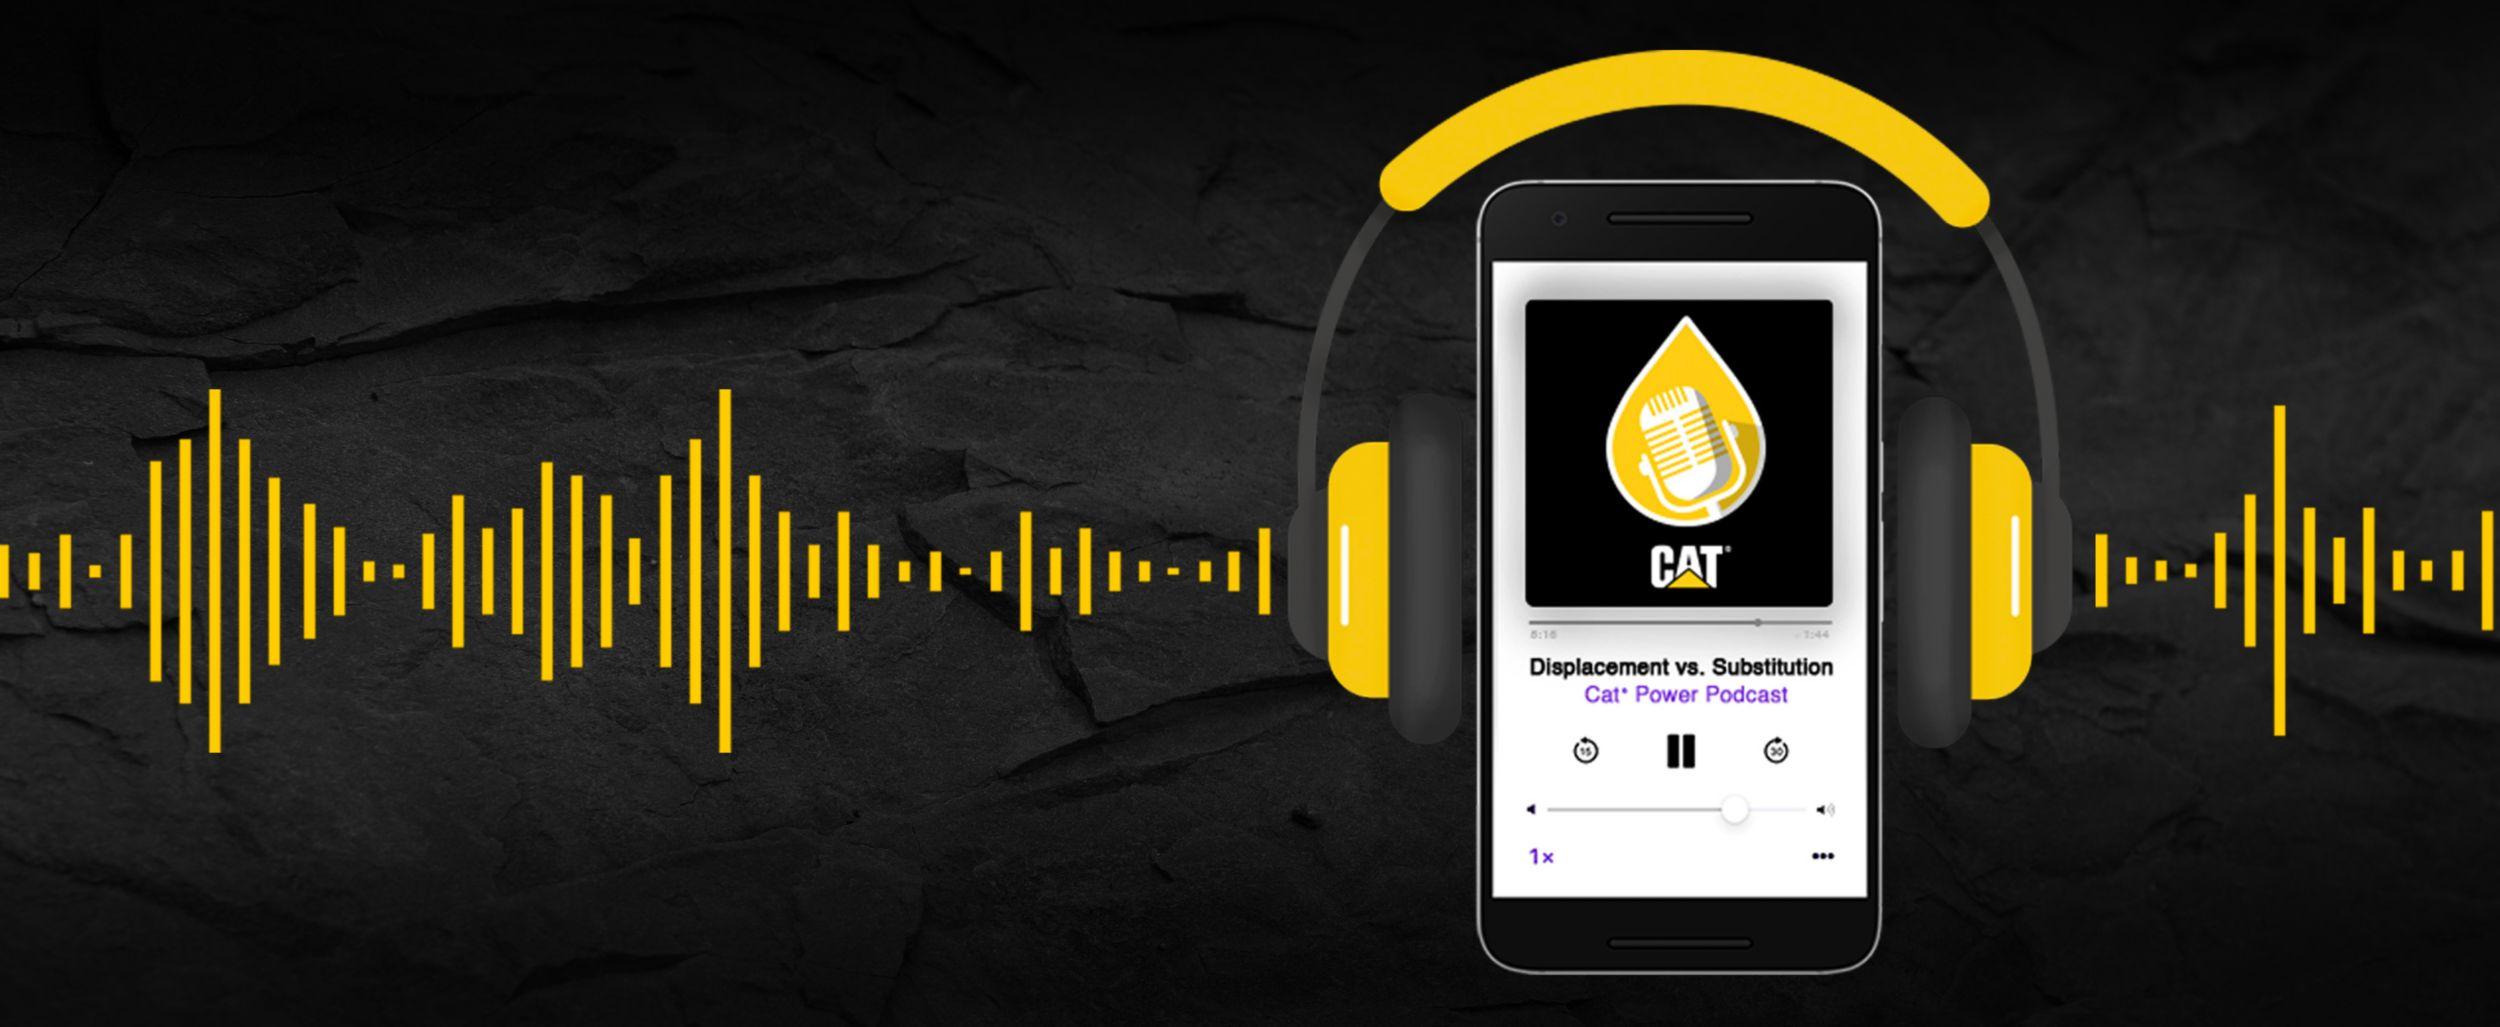 Cat Power Podcast